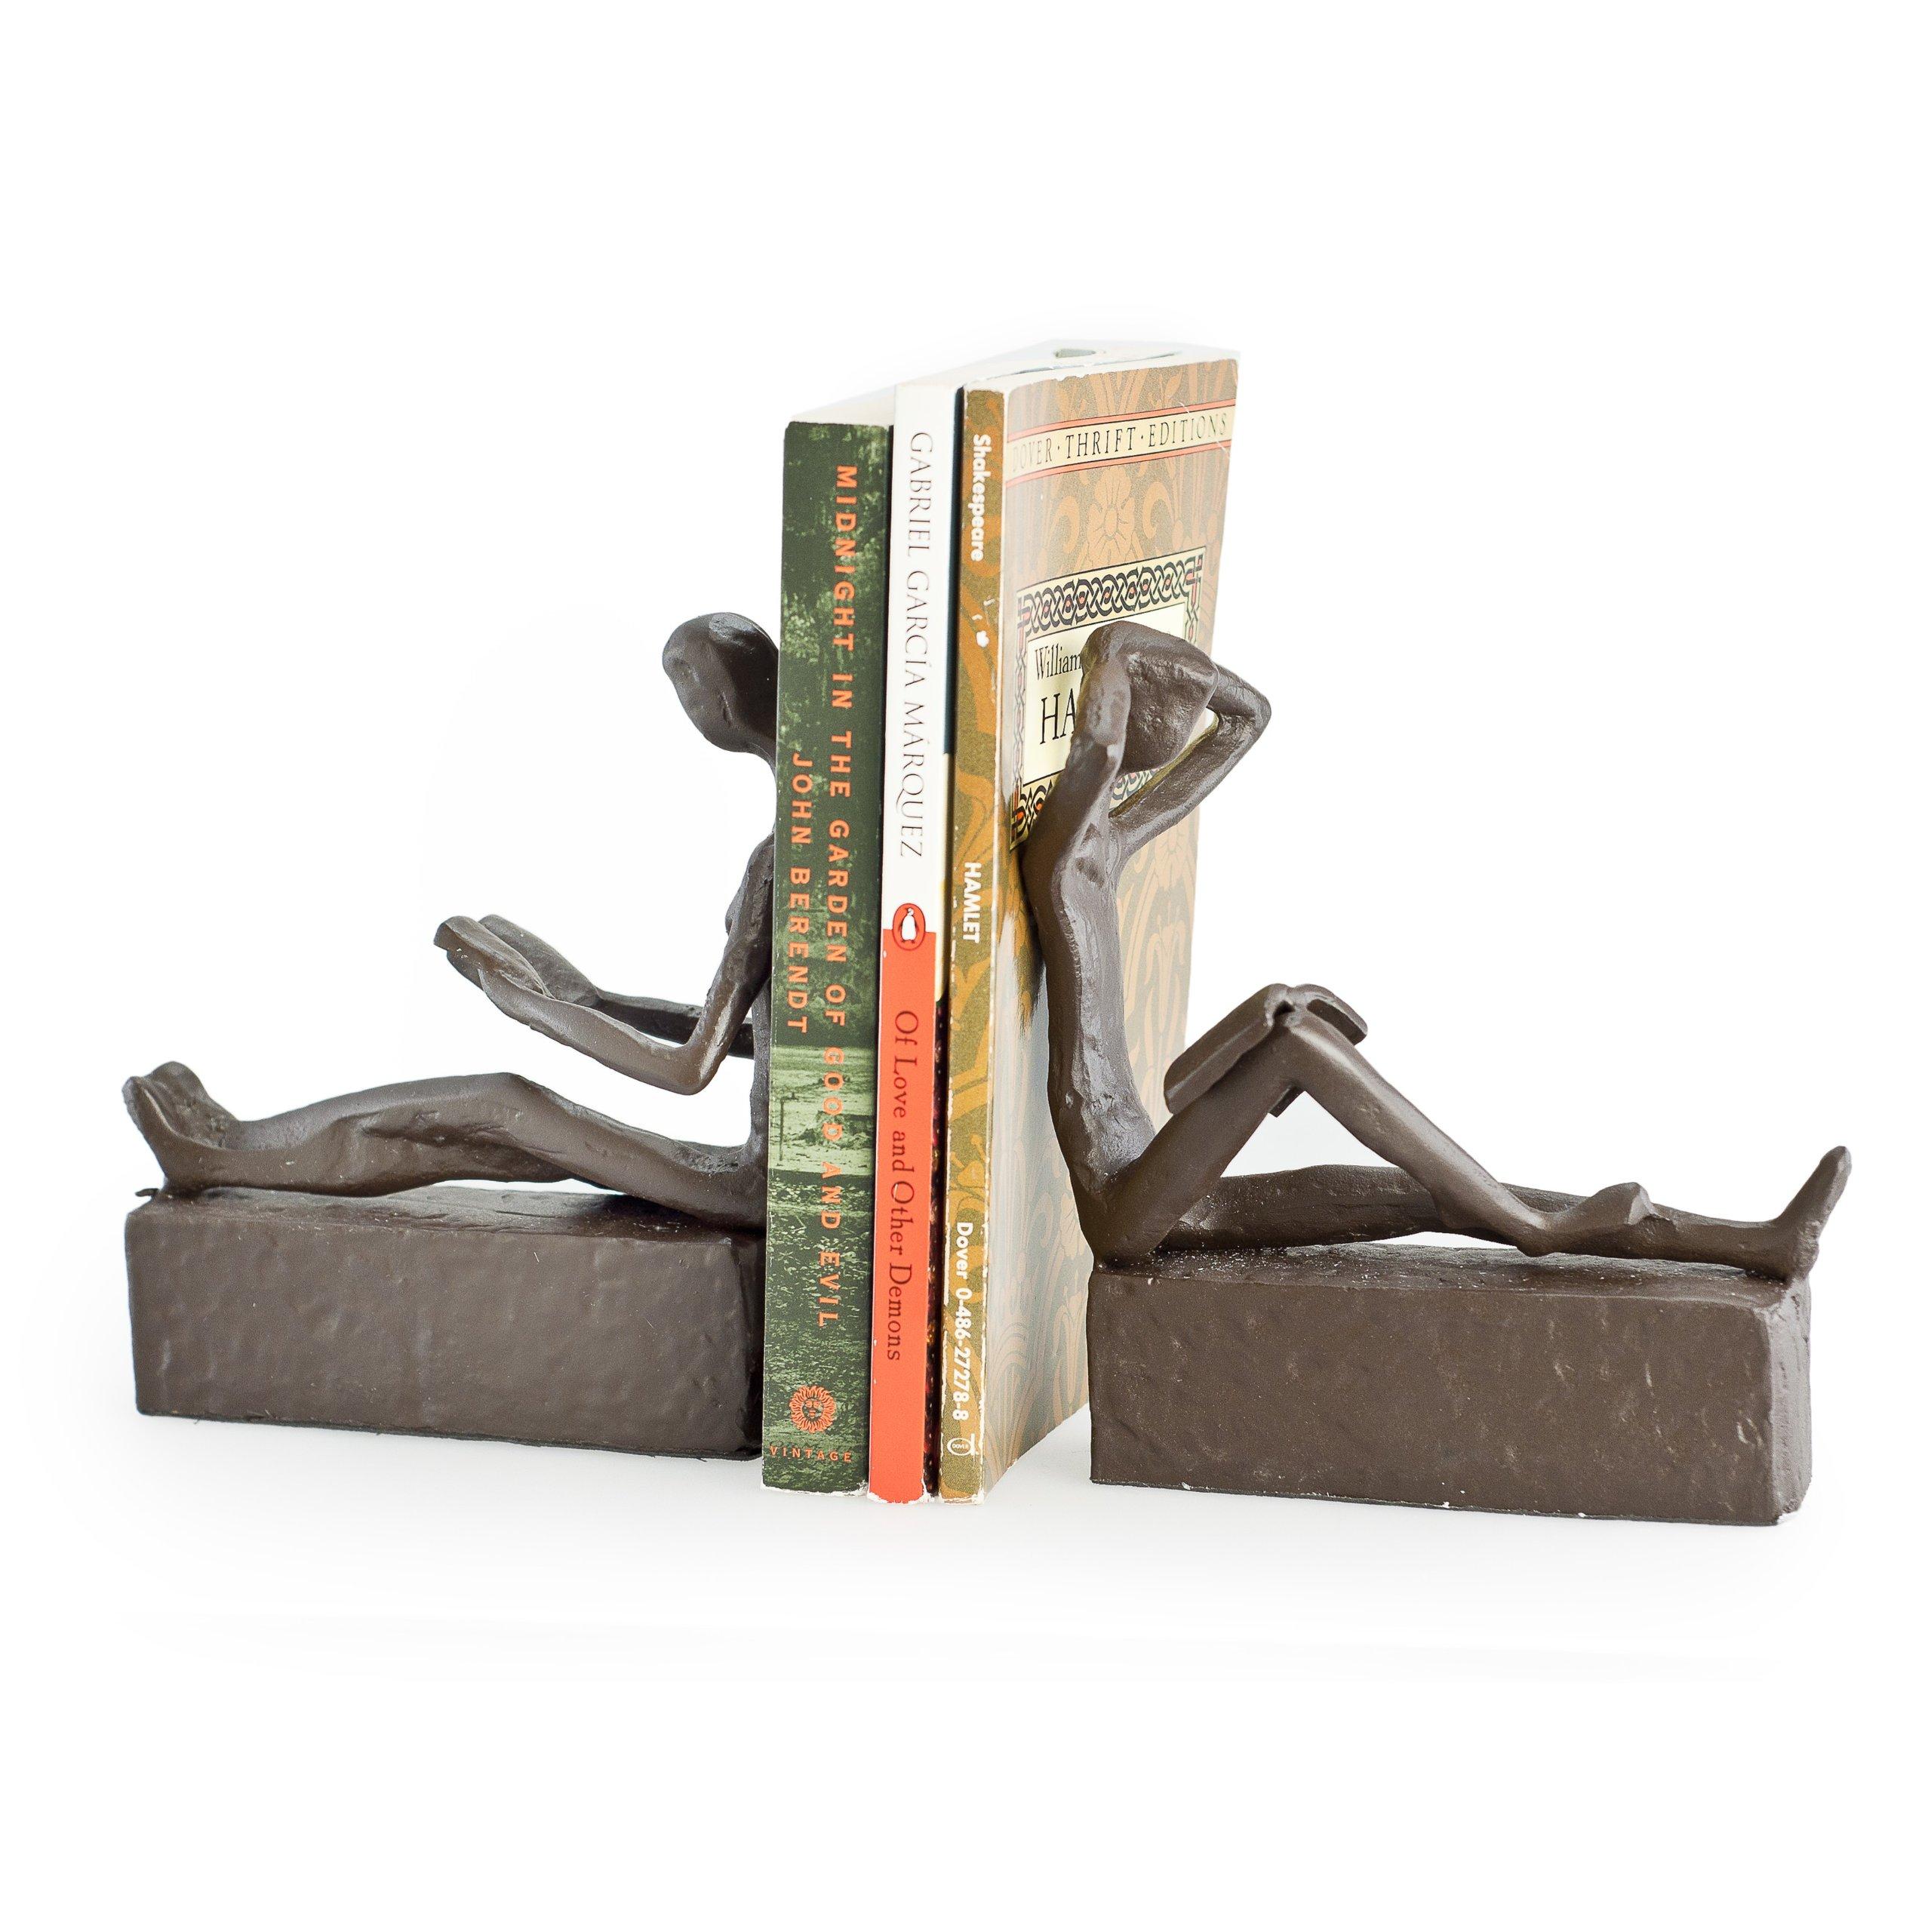 Danya B. ZI09013 Decorative Book Shelf Decor - Man and Woman Reading Metal Bookend Set by Danya B